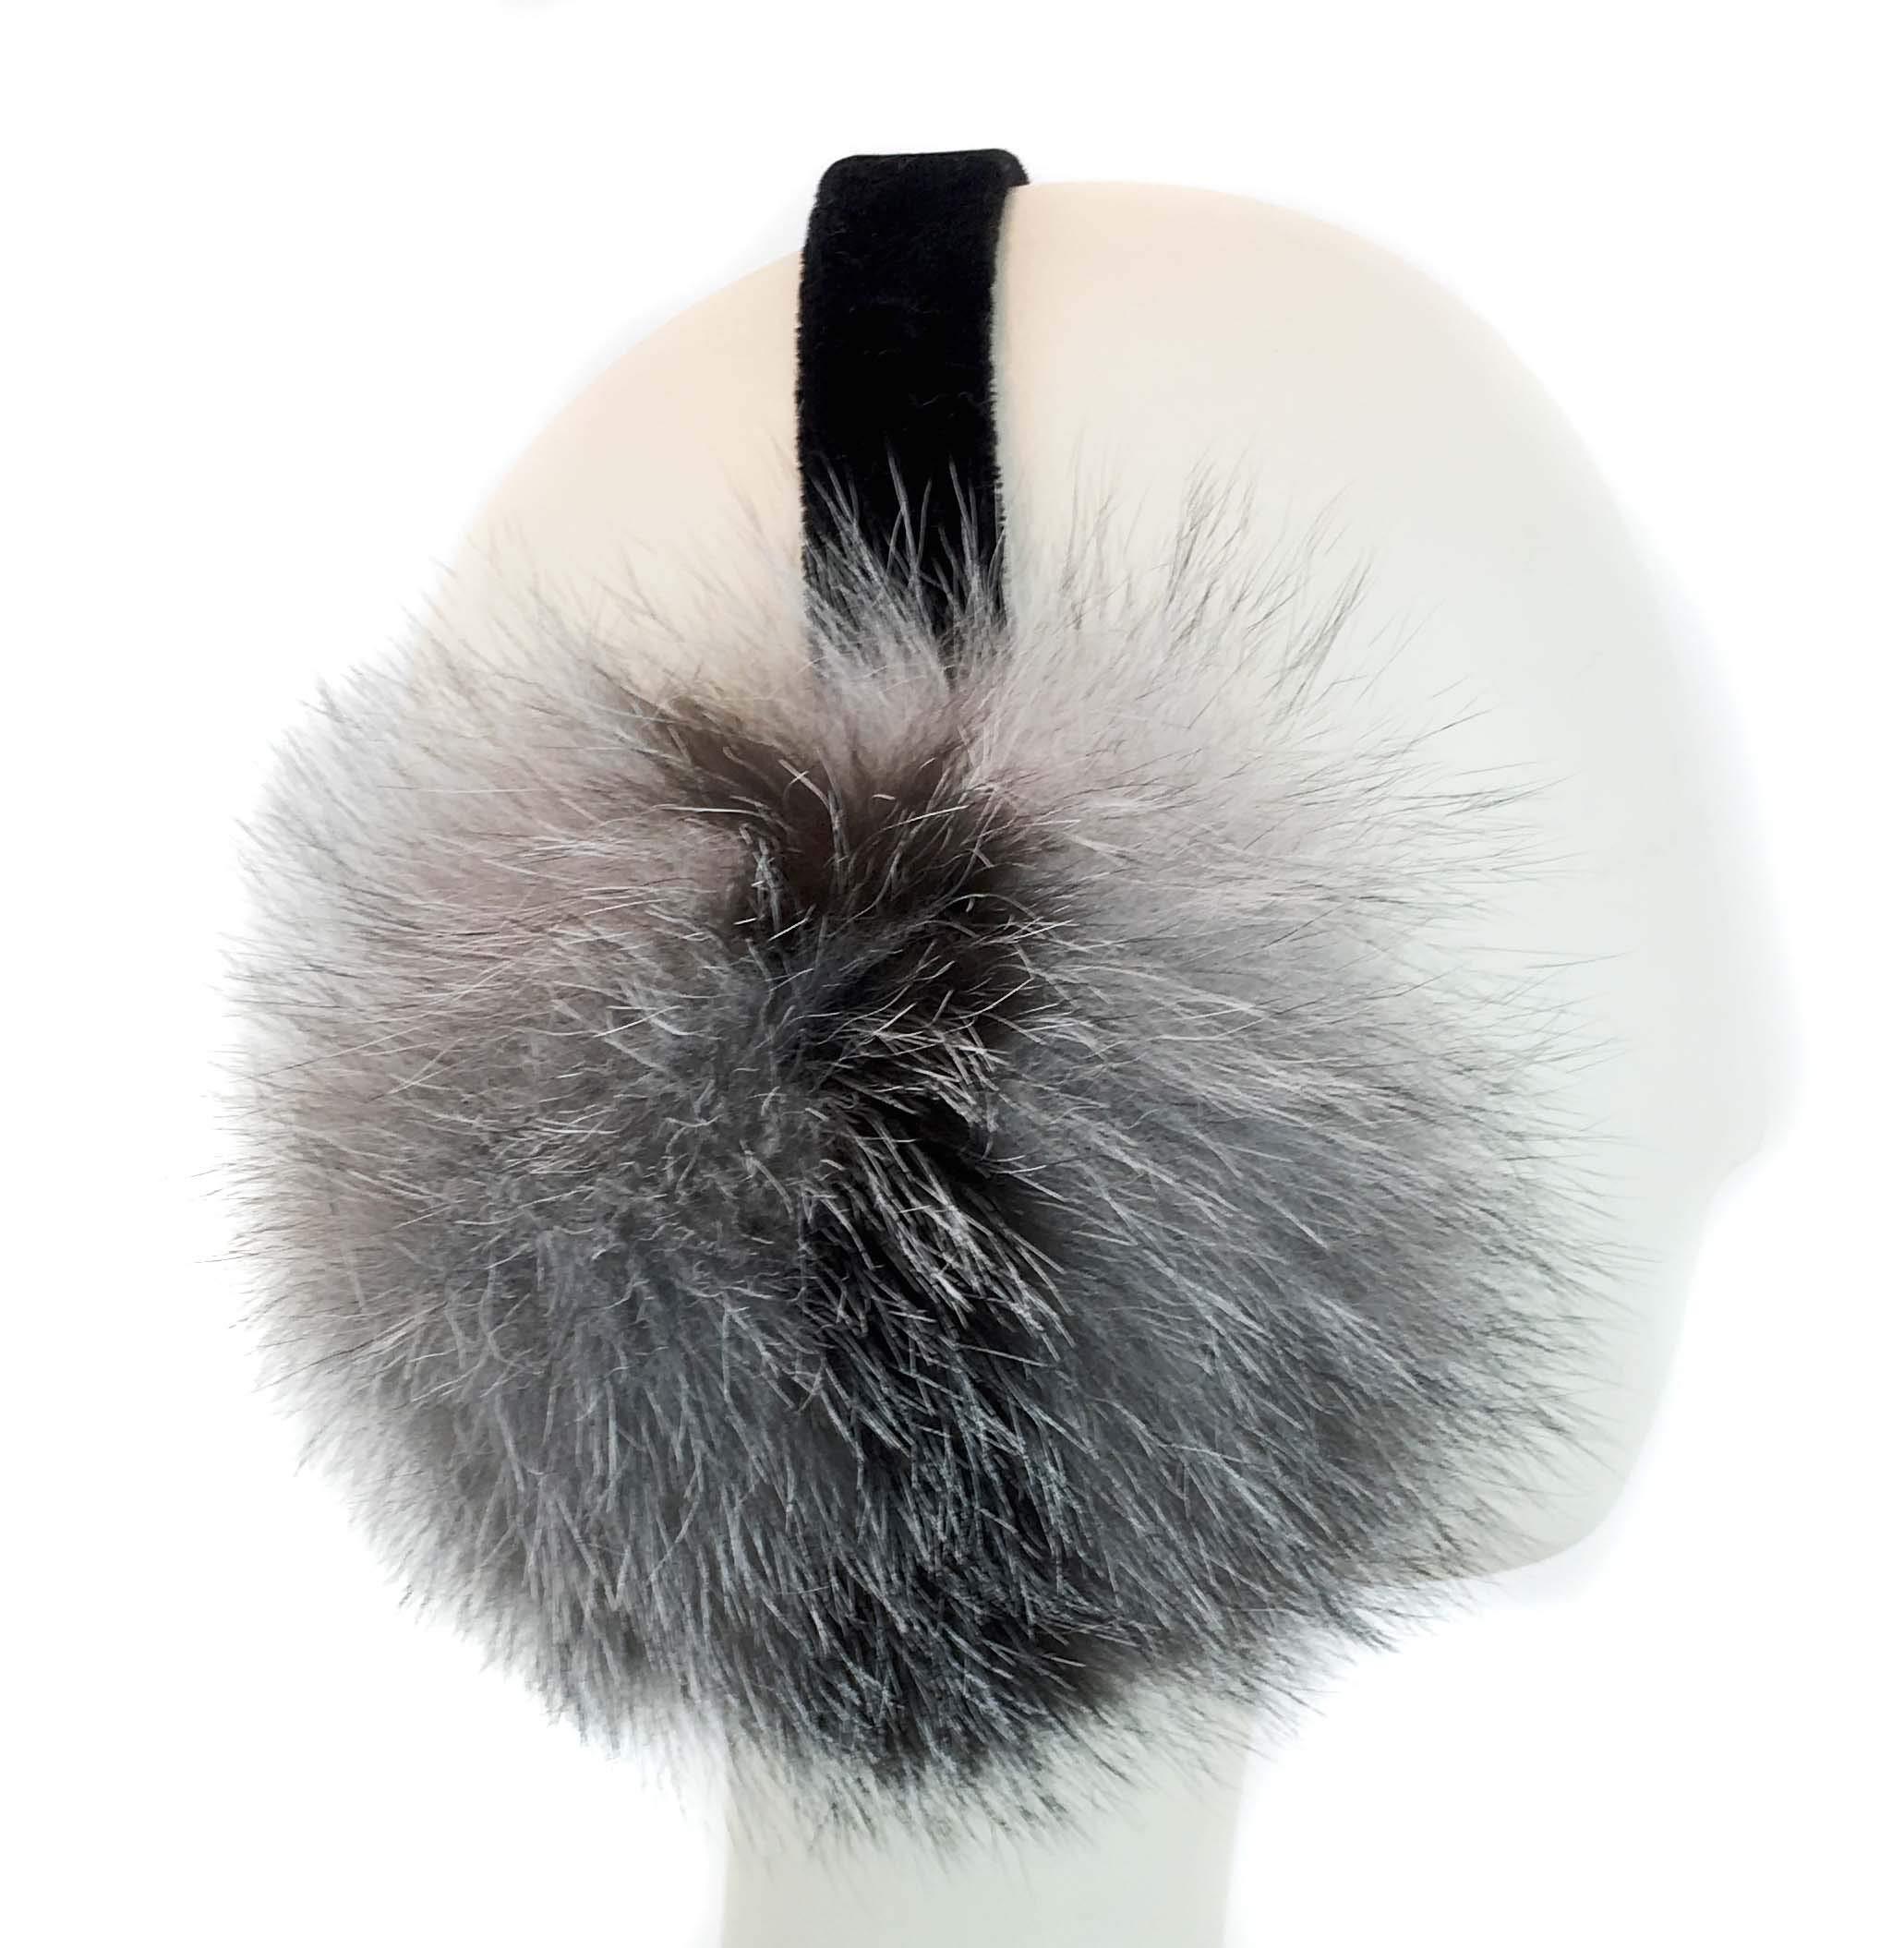 Surell Fox Fur Earmuff with Velvet Band - Winter Ear Muffs - Cold Weather Head Warmer (Stripe)